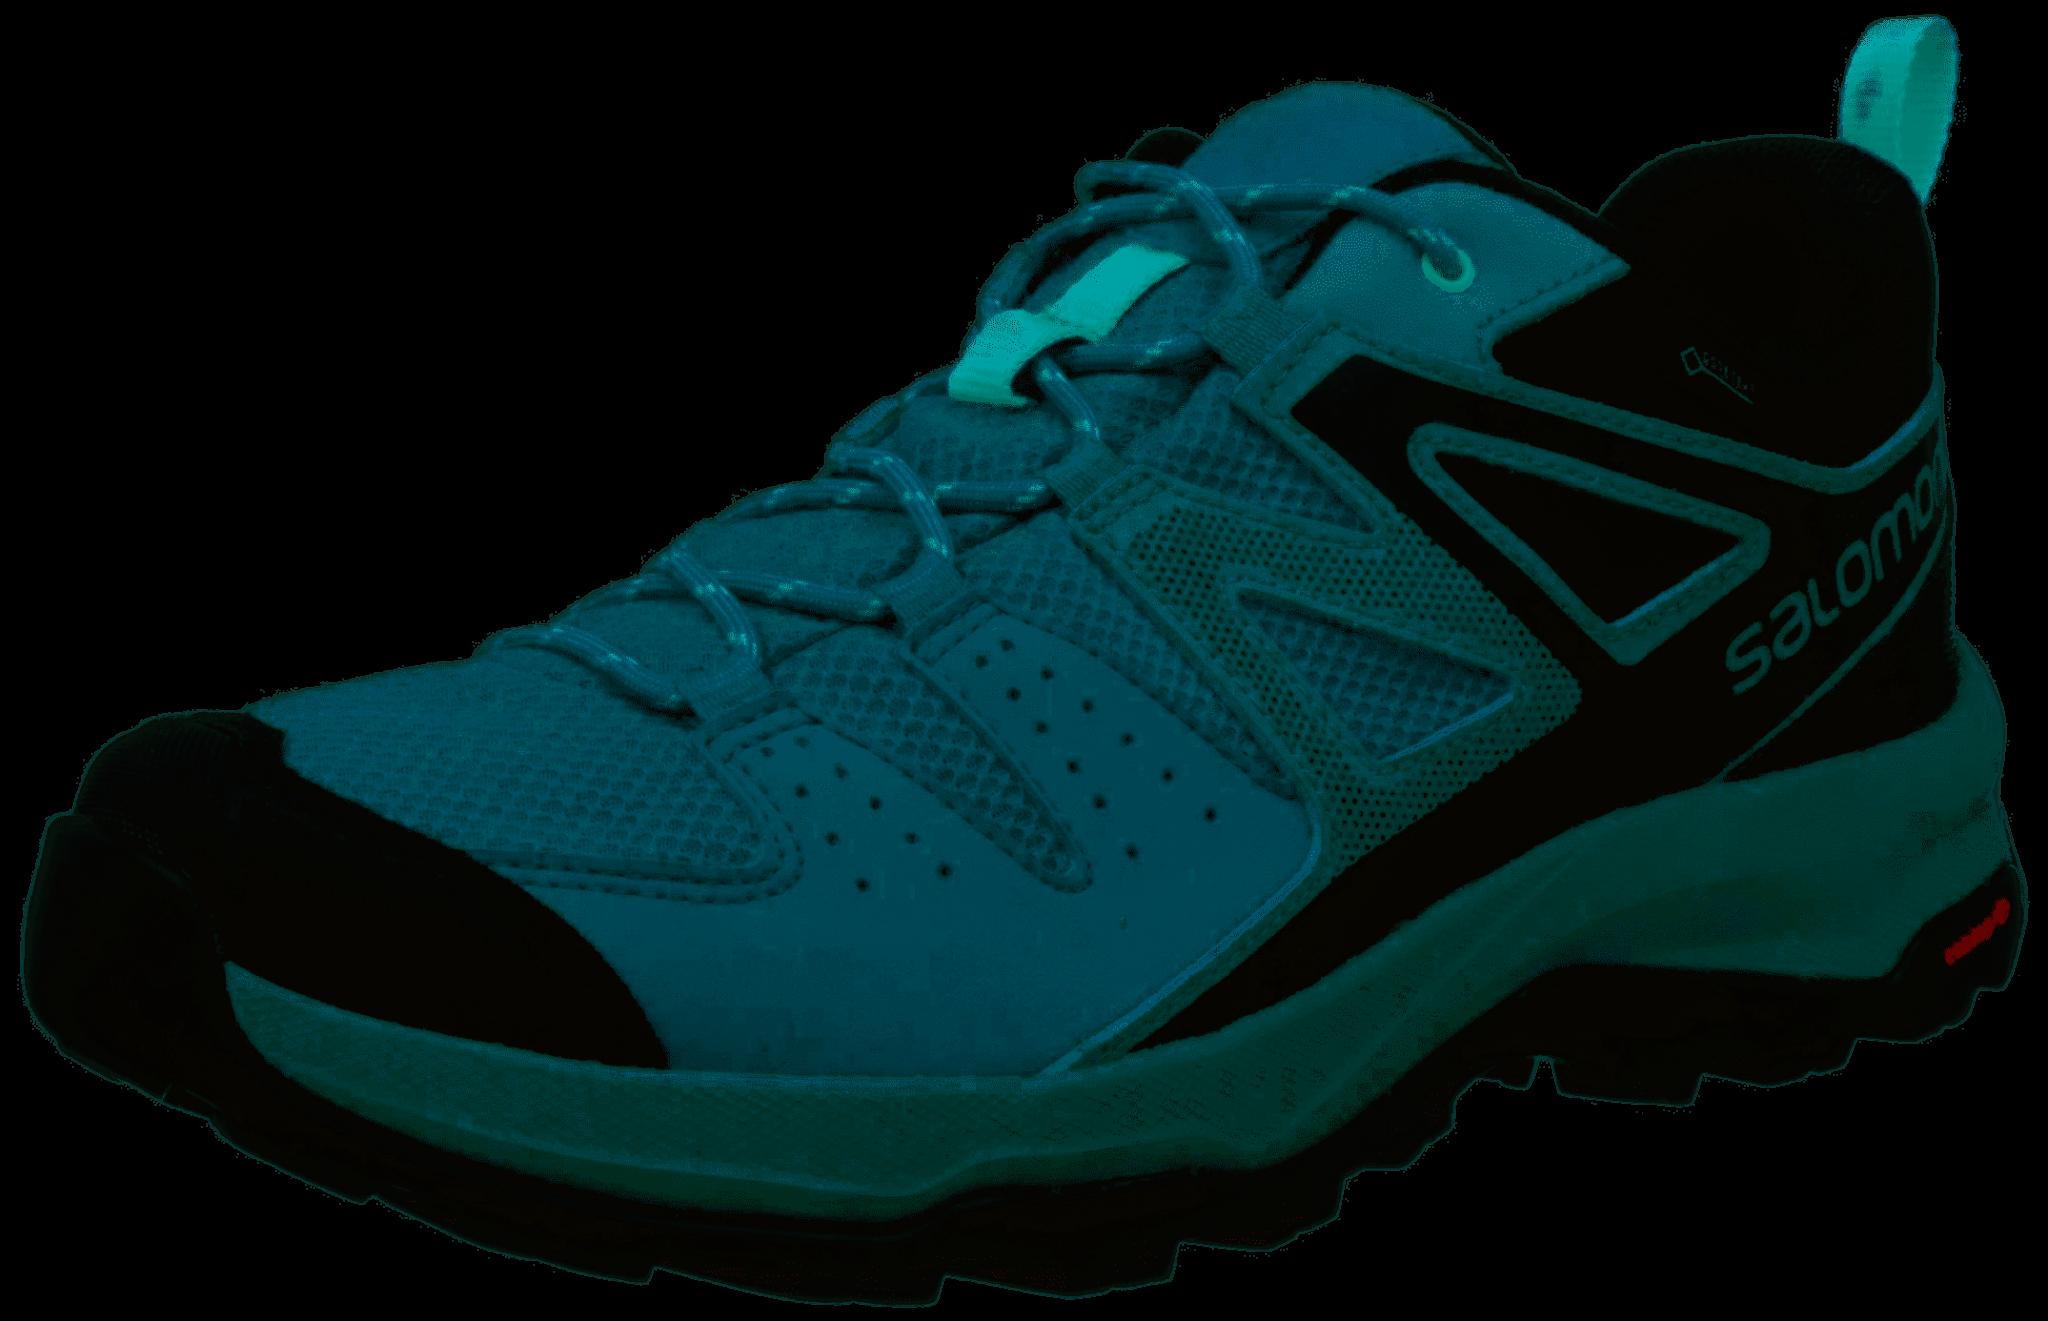 brand new lower price with new release Salomon X Radiant GTX Ladies Walking Shoe (2019)